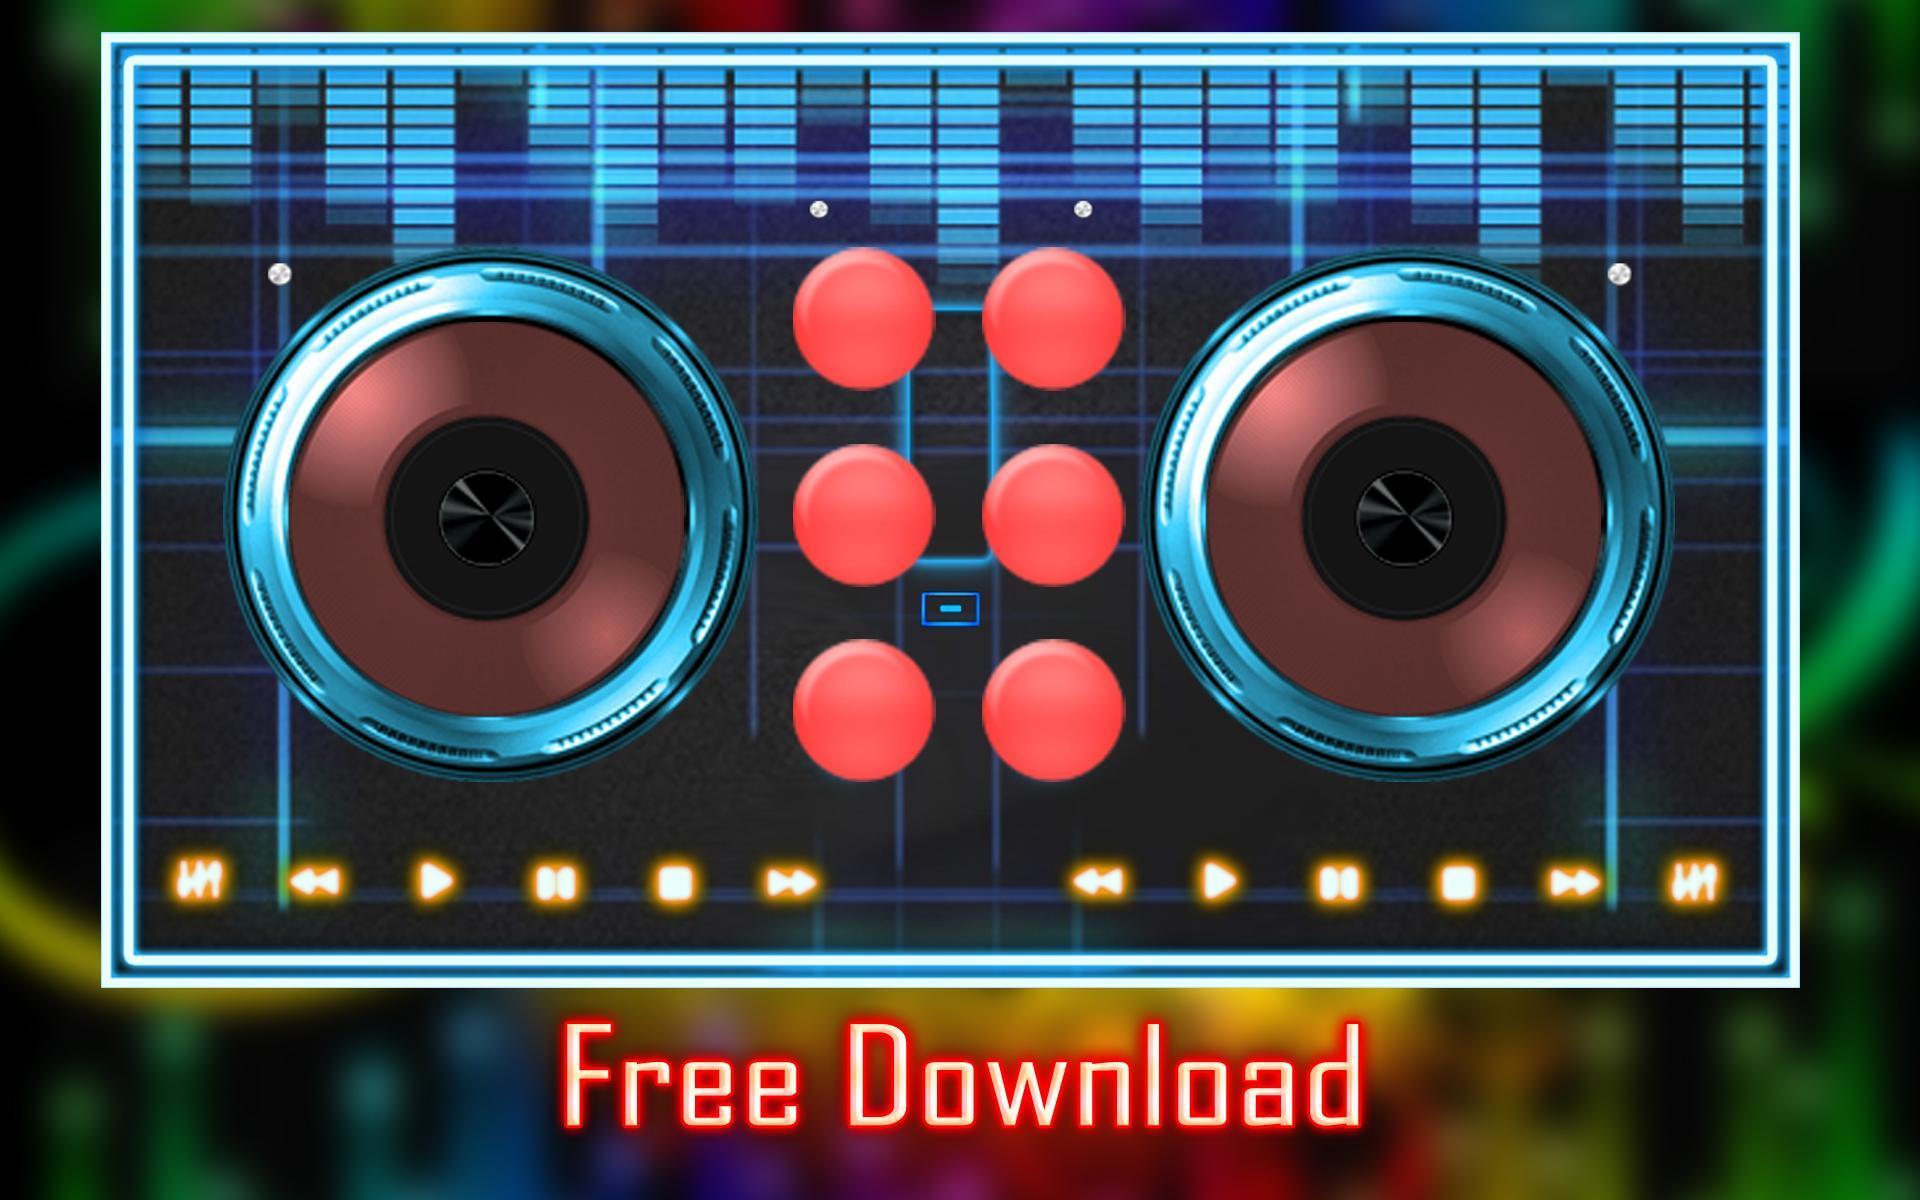 DJ Studio Music Mixer for Android - APK Download